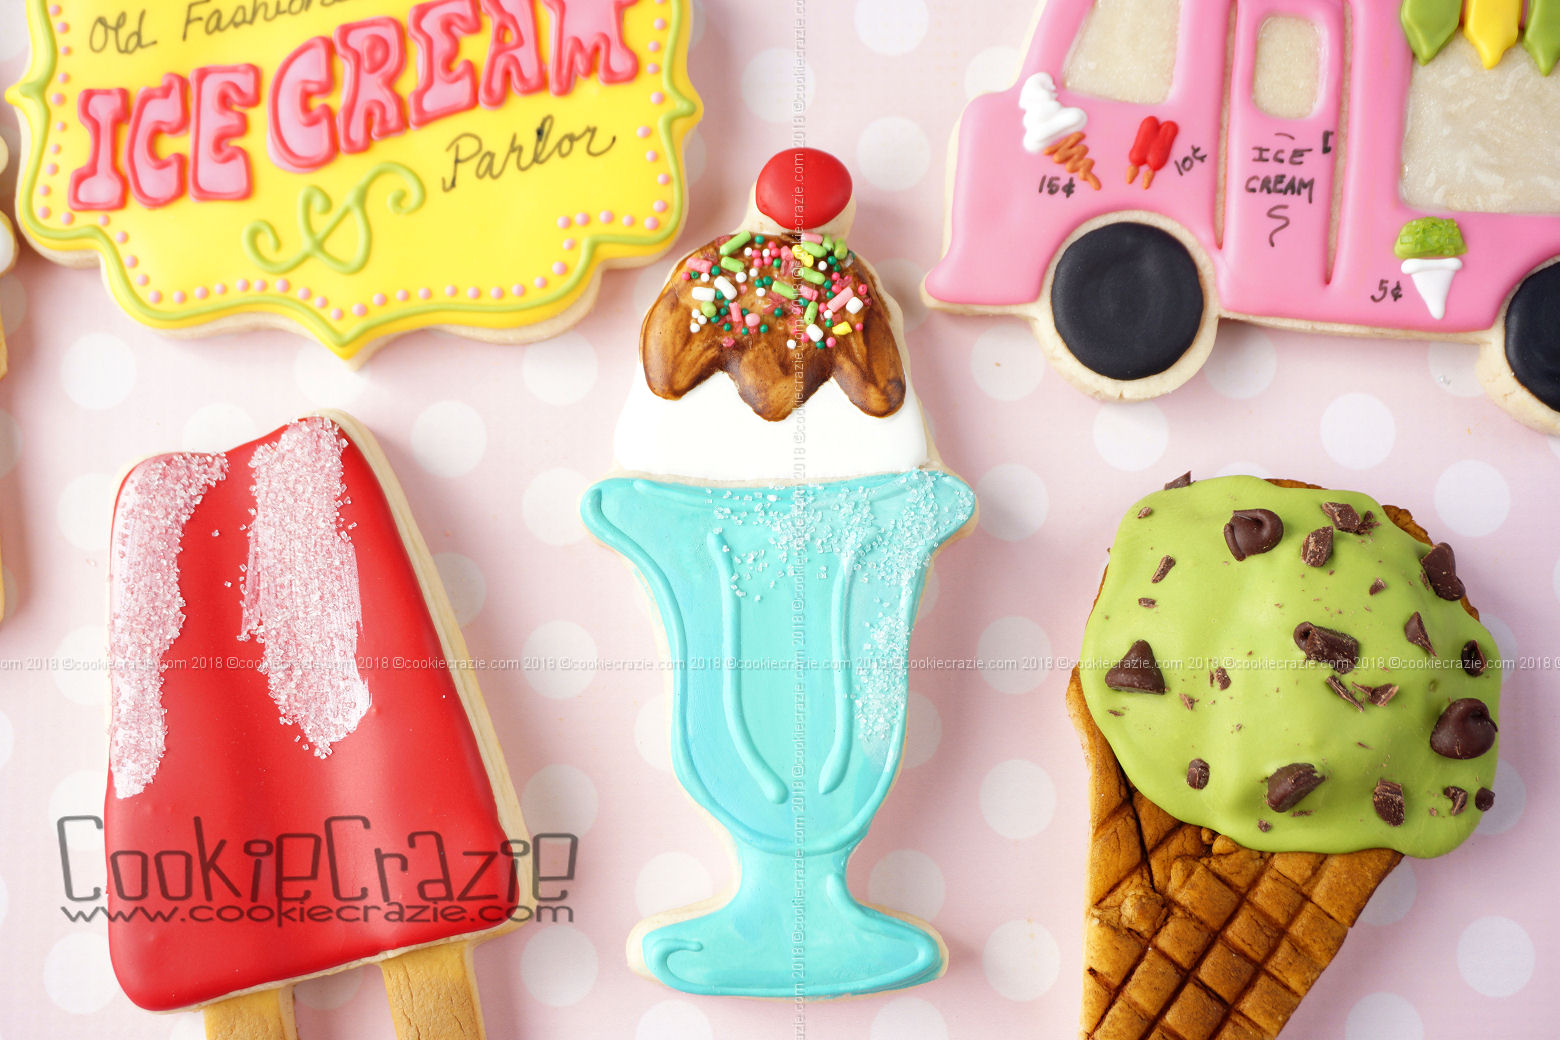 Ice Cream Sundae w Cherry Decorated Sugar Cookie YouTube video  HERE